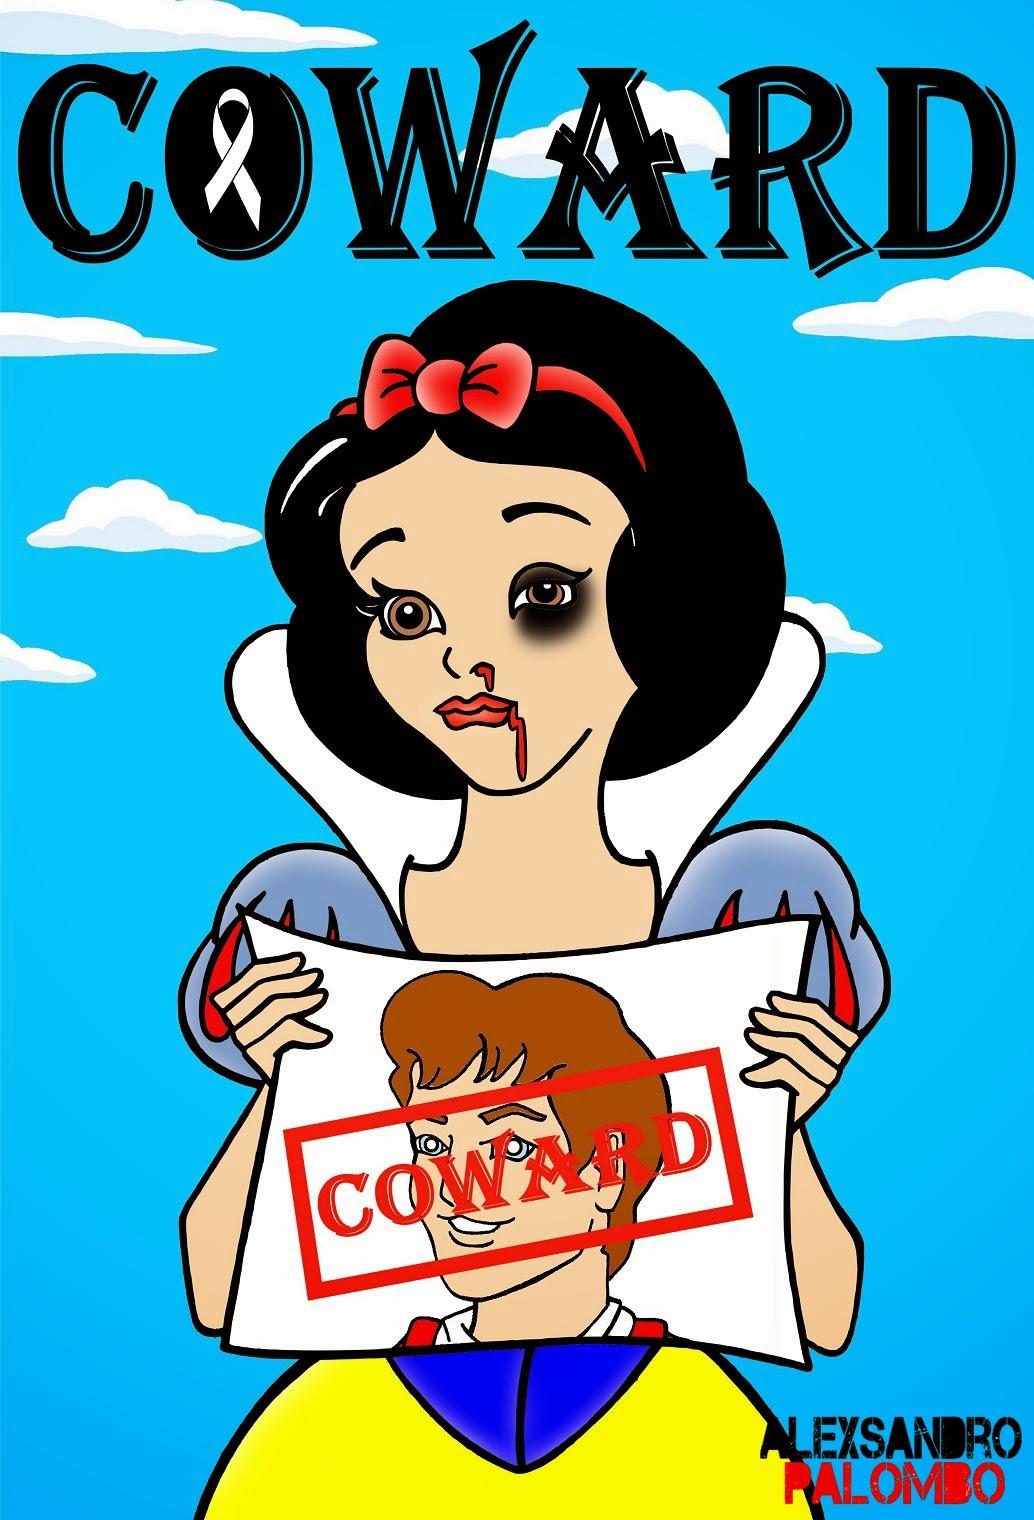 Disney Princess Snow White COWARD No Violence Against Women by aleXsandro Palombo Web